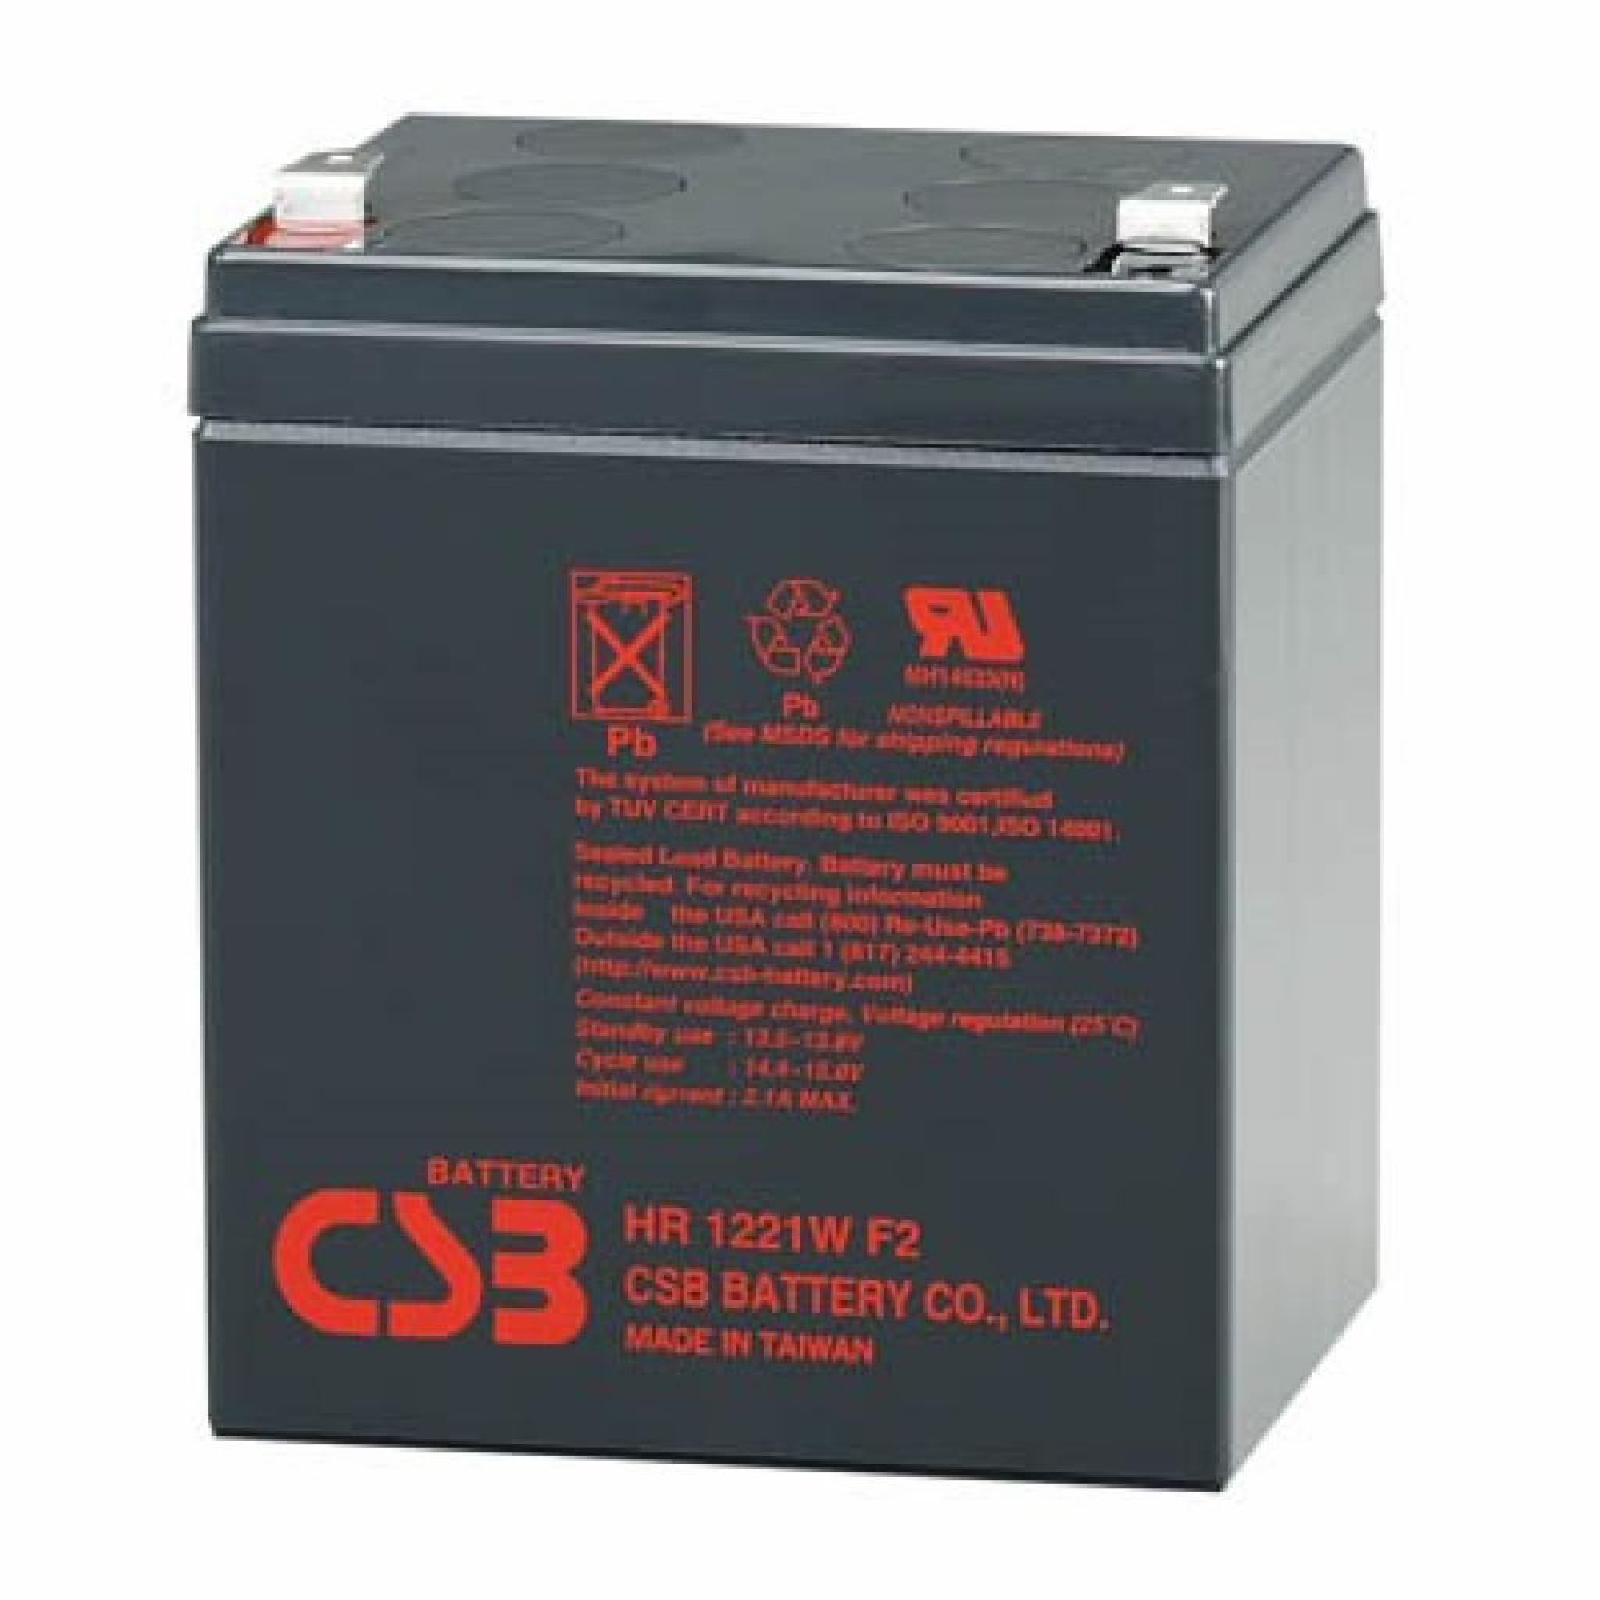 Батарея к ИБП 12В 5 Ач CSB (HR1221W)